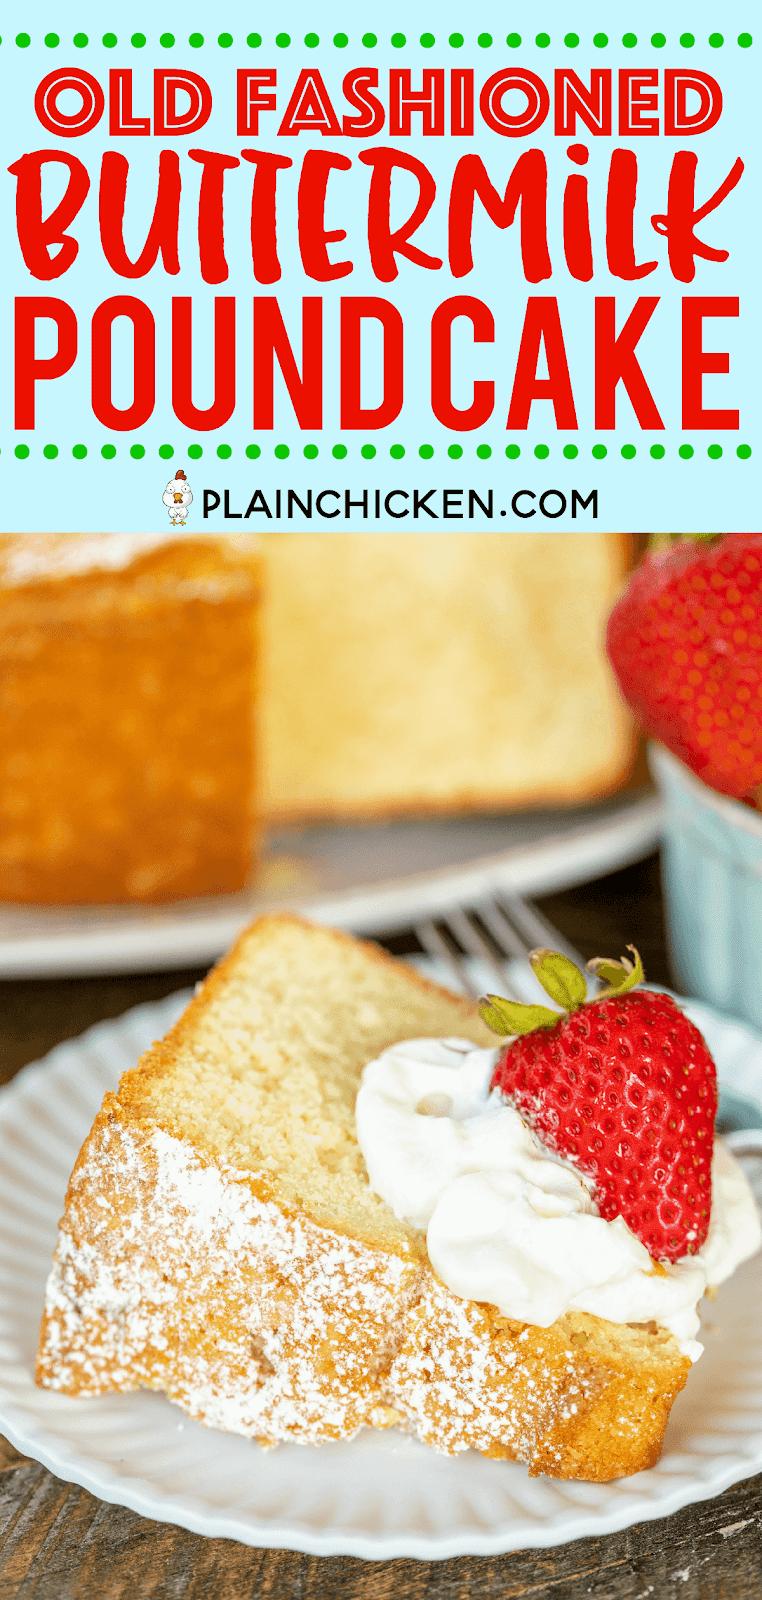 Old Fashioned Southern Pound Cake Recipe